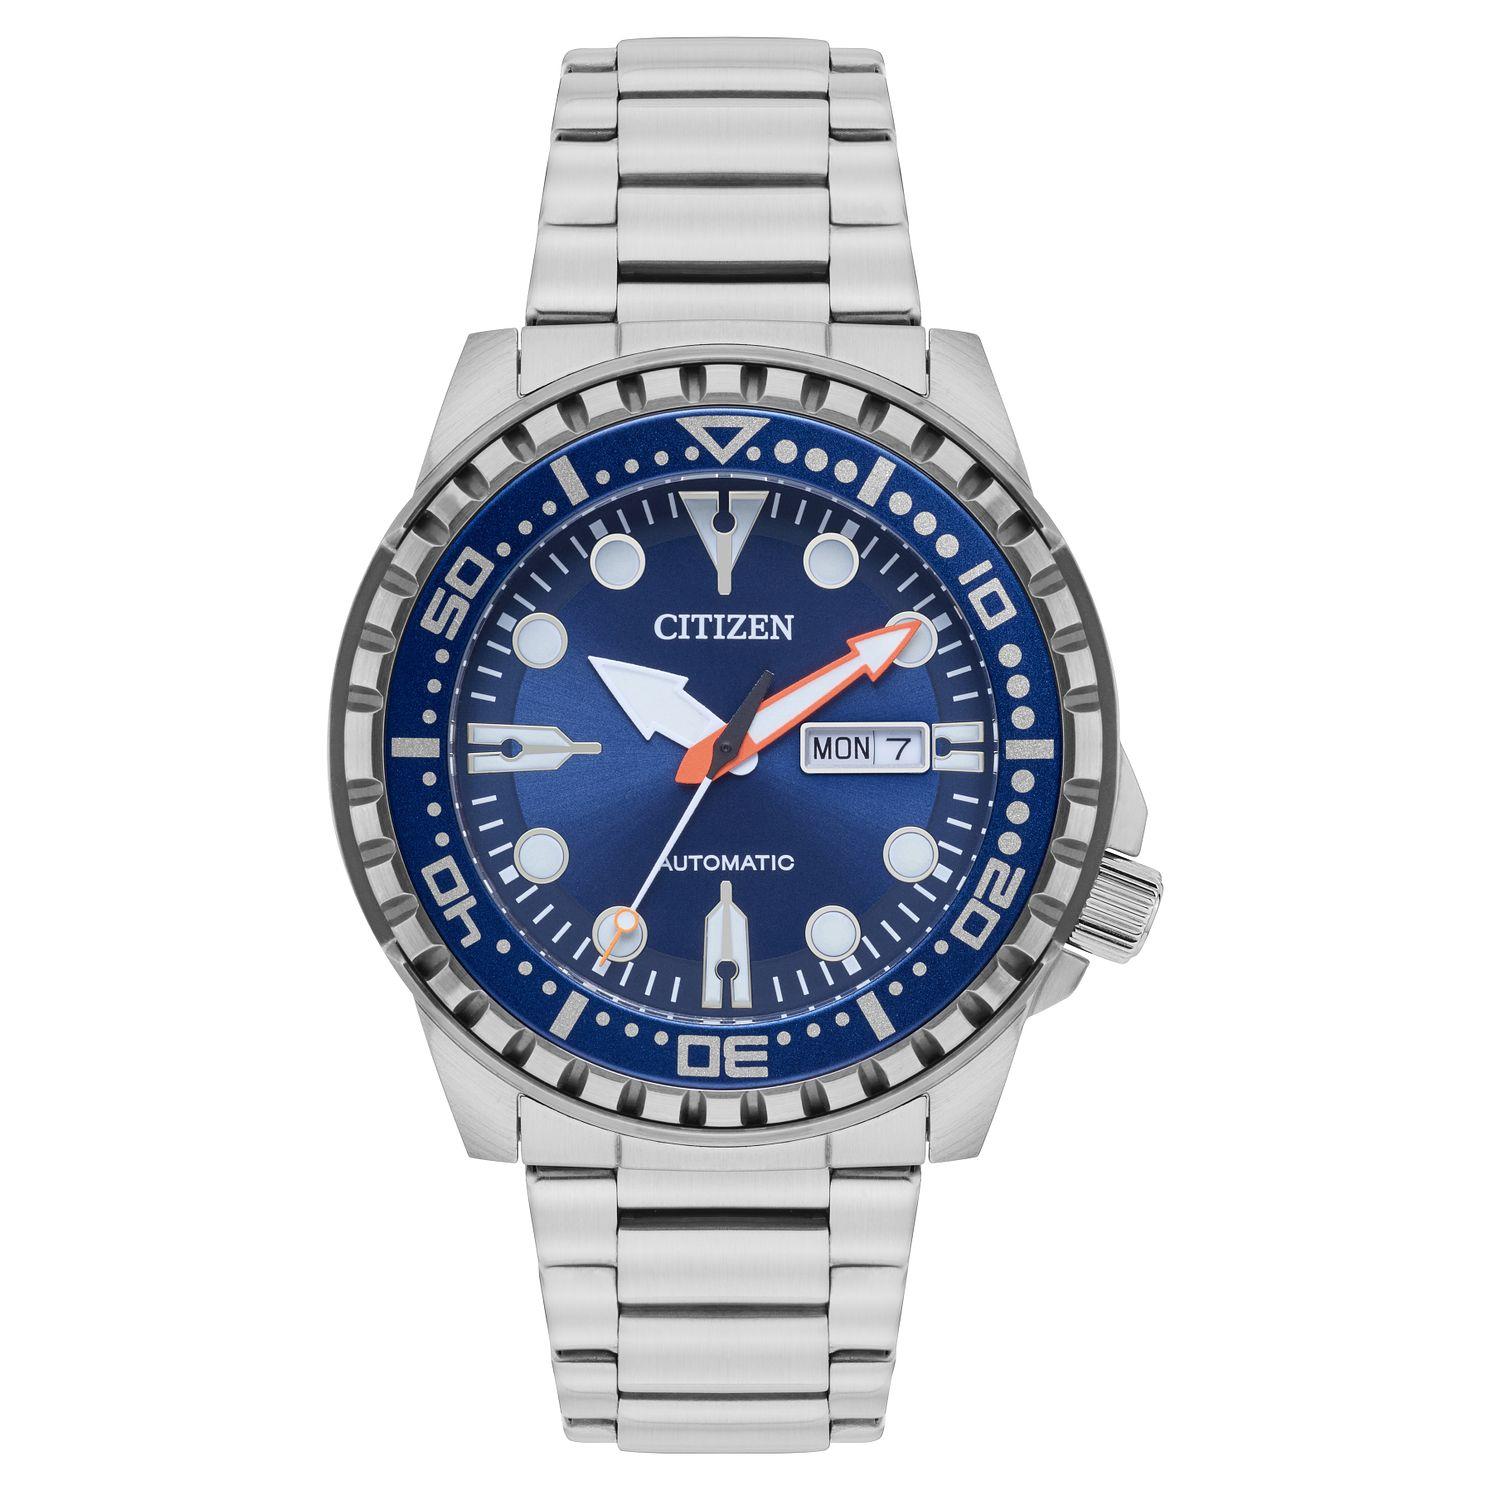 Citizen Men's Automatic Sport Diver Style Watch Set NH8381-63L - £169.99 (with code) @ H Samuel